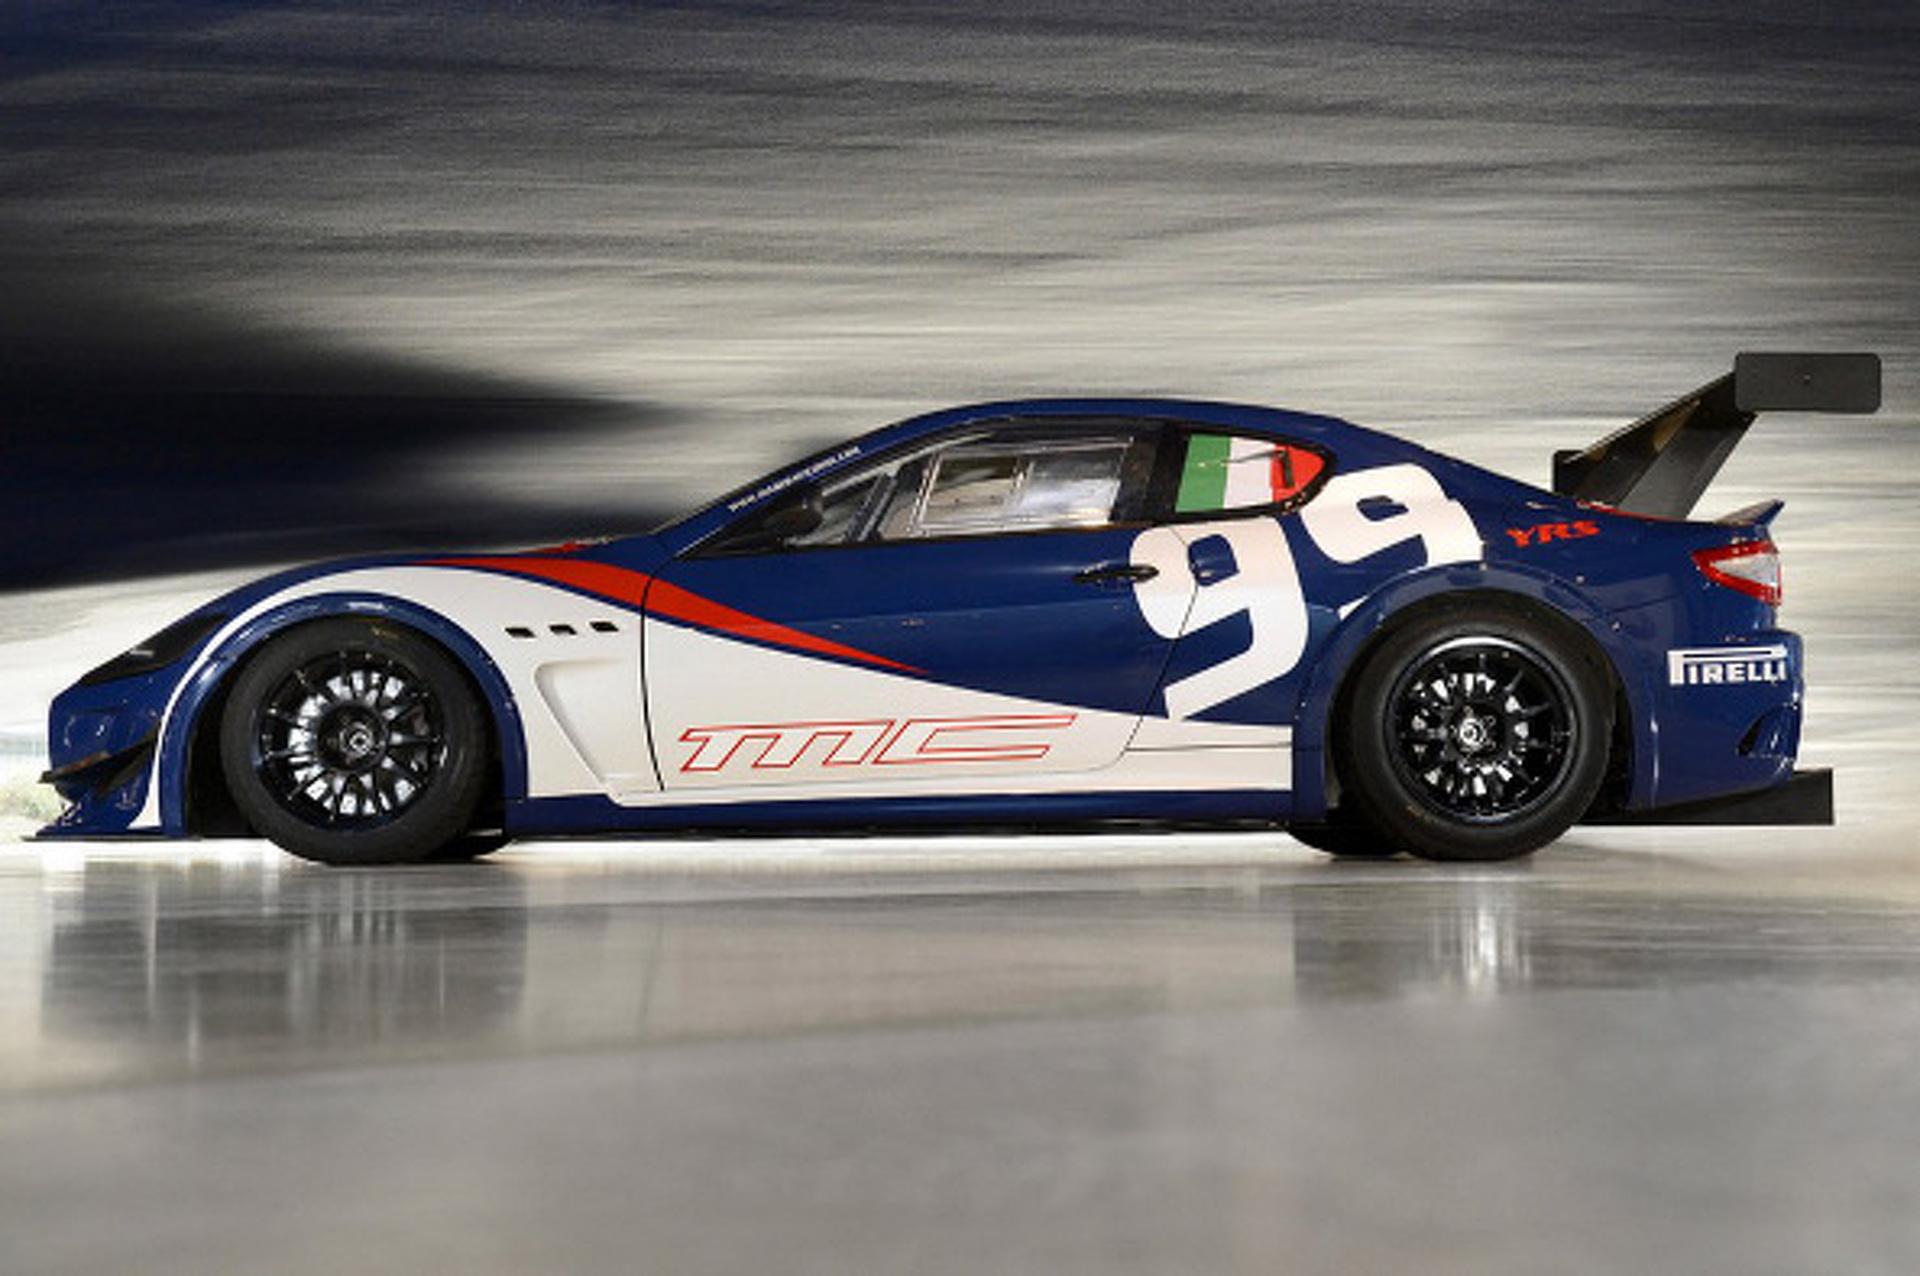 GranTurismo MC Trofeo is How Maserati Does Racing